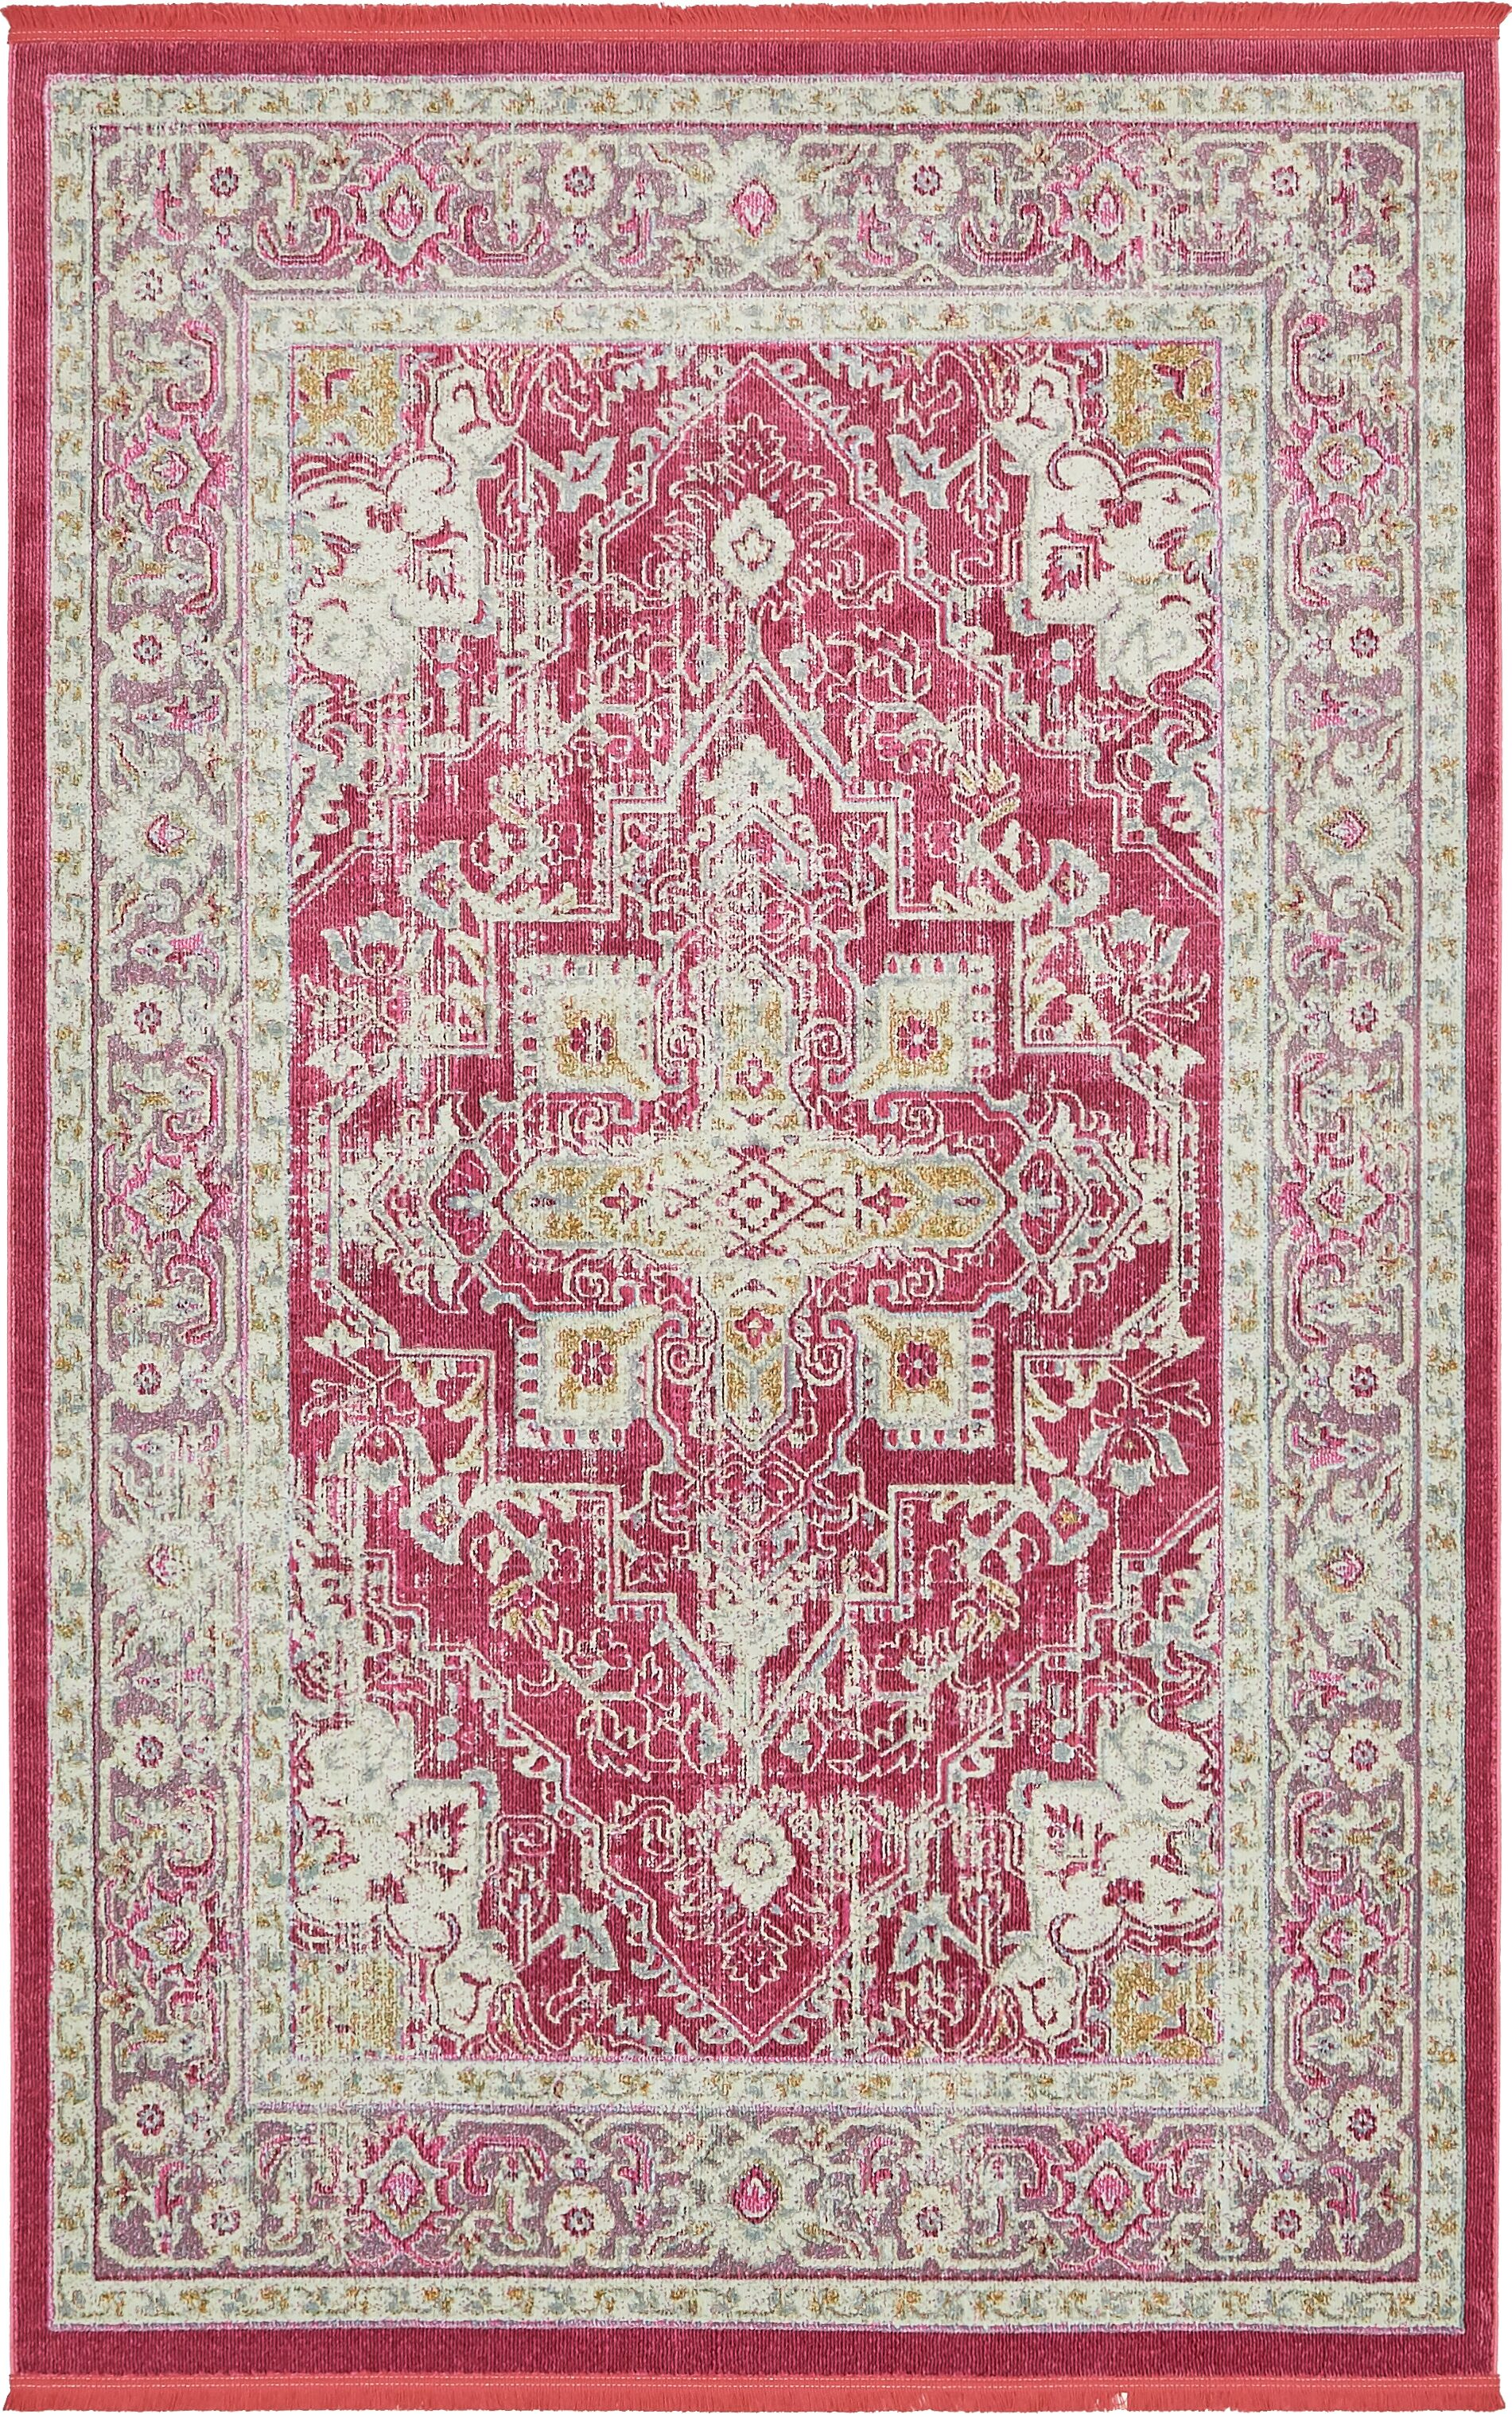 Lonerock European Pink Area Rug Rug Size: Rectangle 5'5